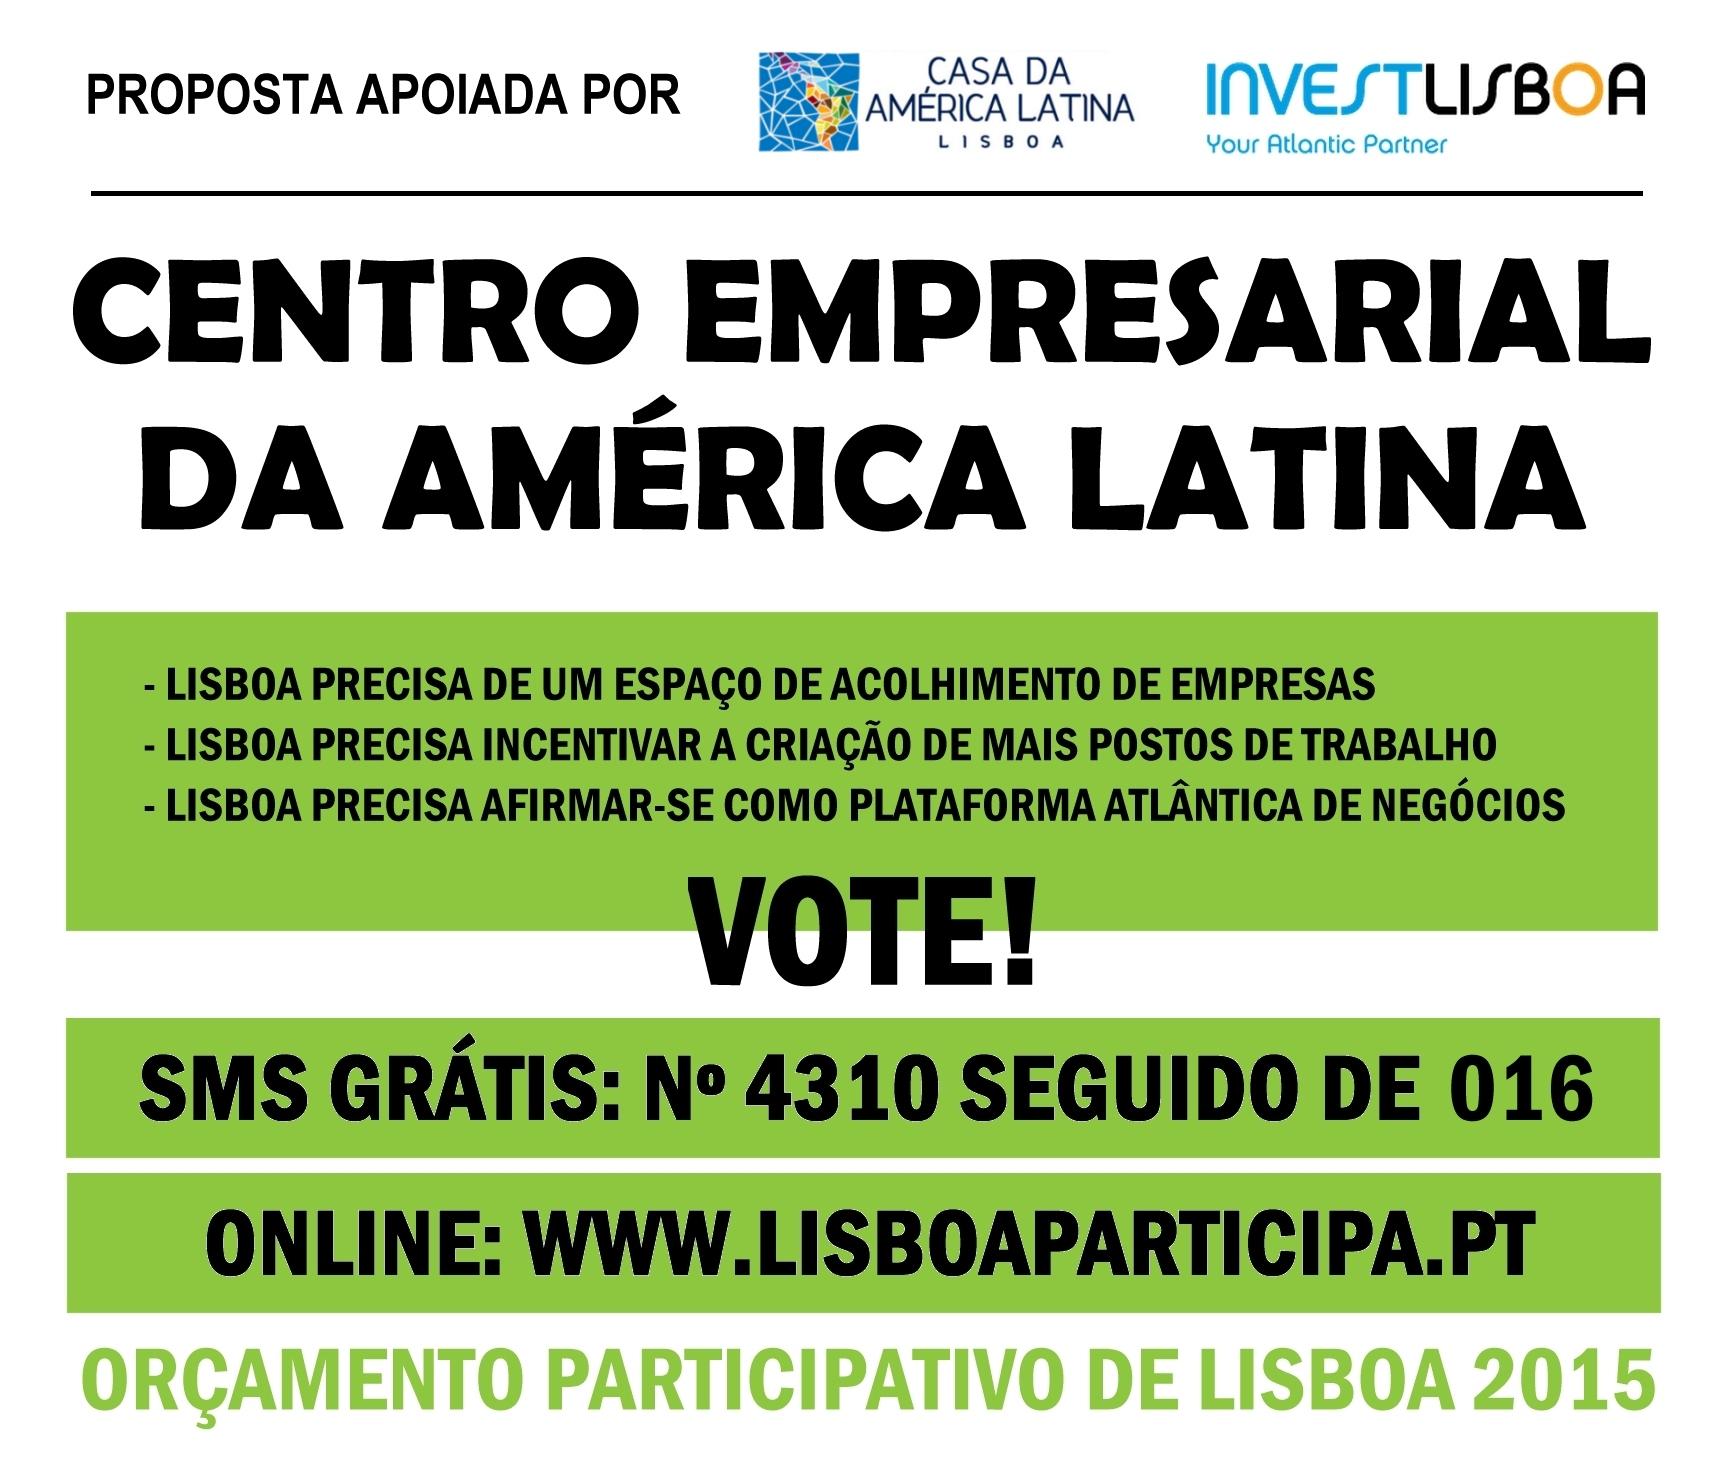 OP016AmericaLatina_v2